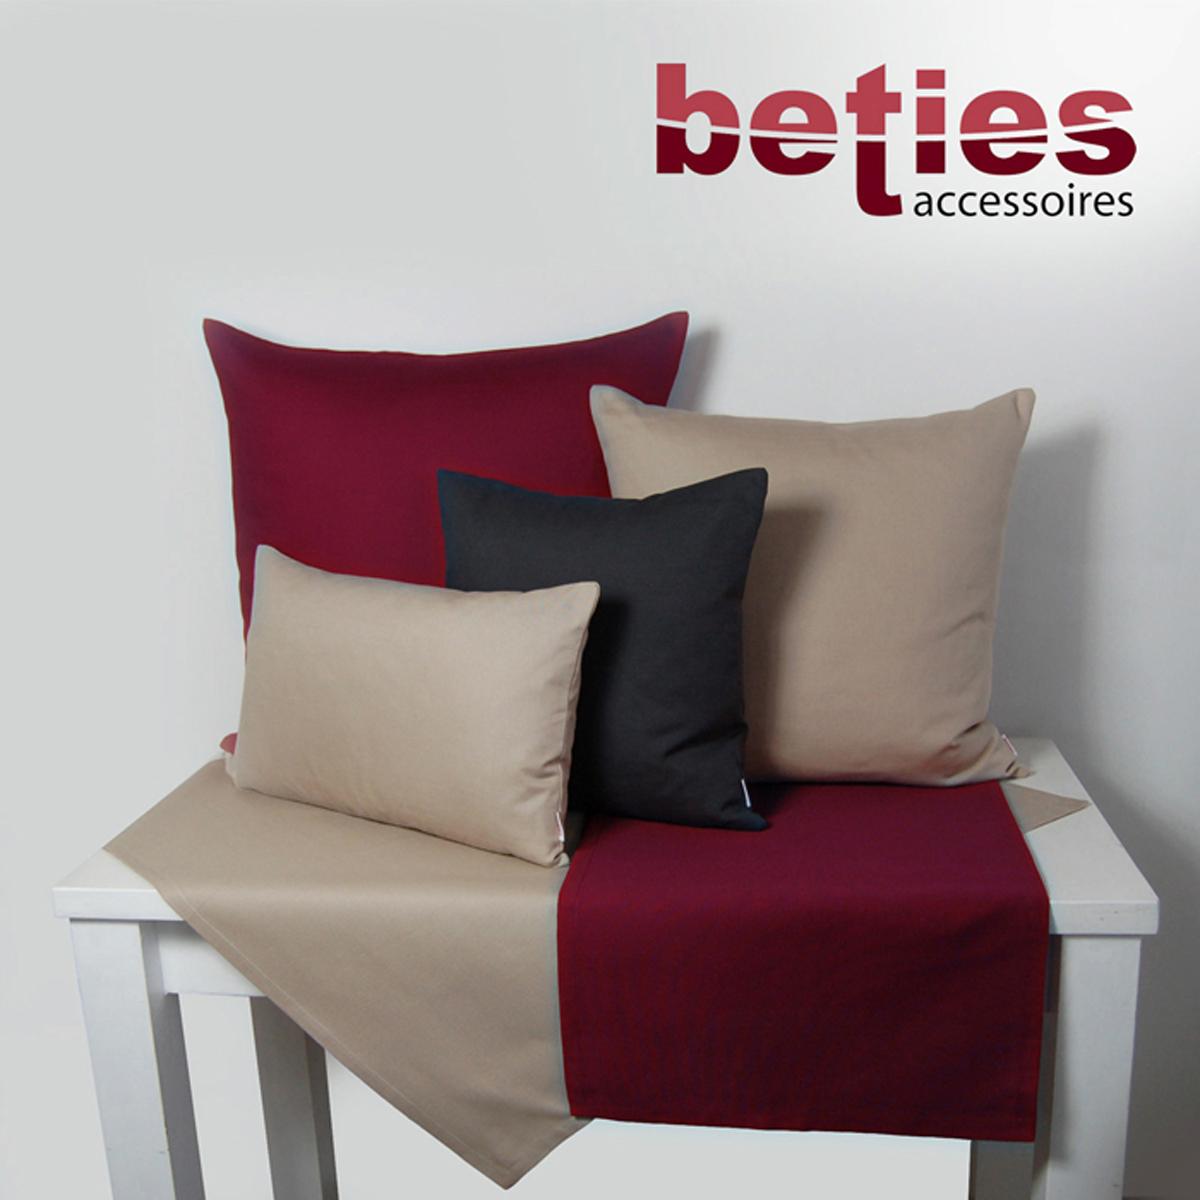 beties farbenspiel kissenh lle ca 30x50 cm 100 baumwolle. Black Bedroom Furniture Sets. Home Design Ideas